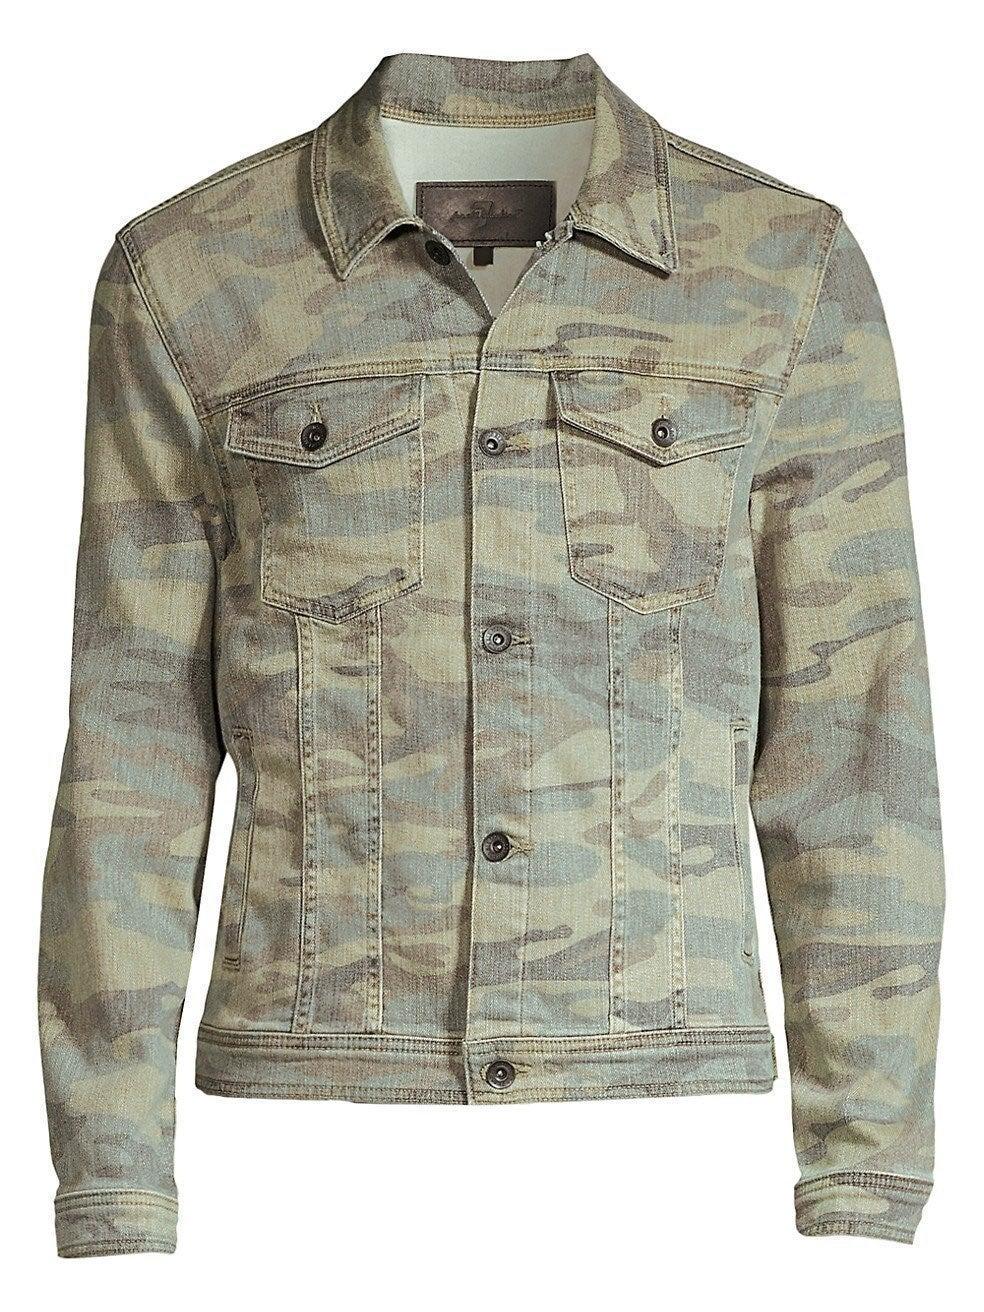 7 For All Mankind Camo Jacket, Medium